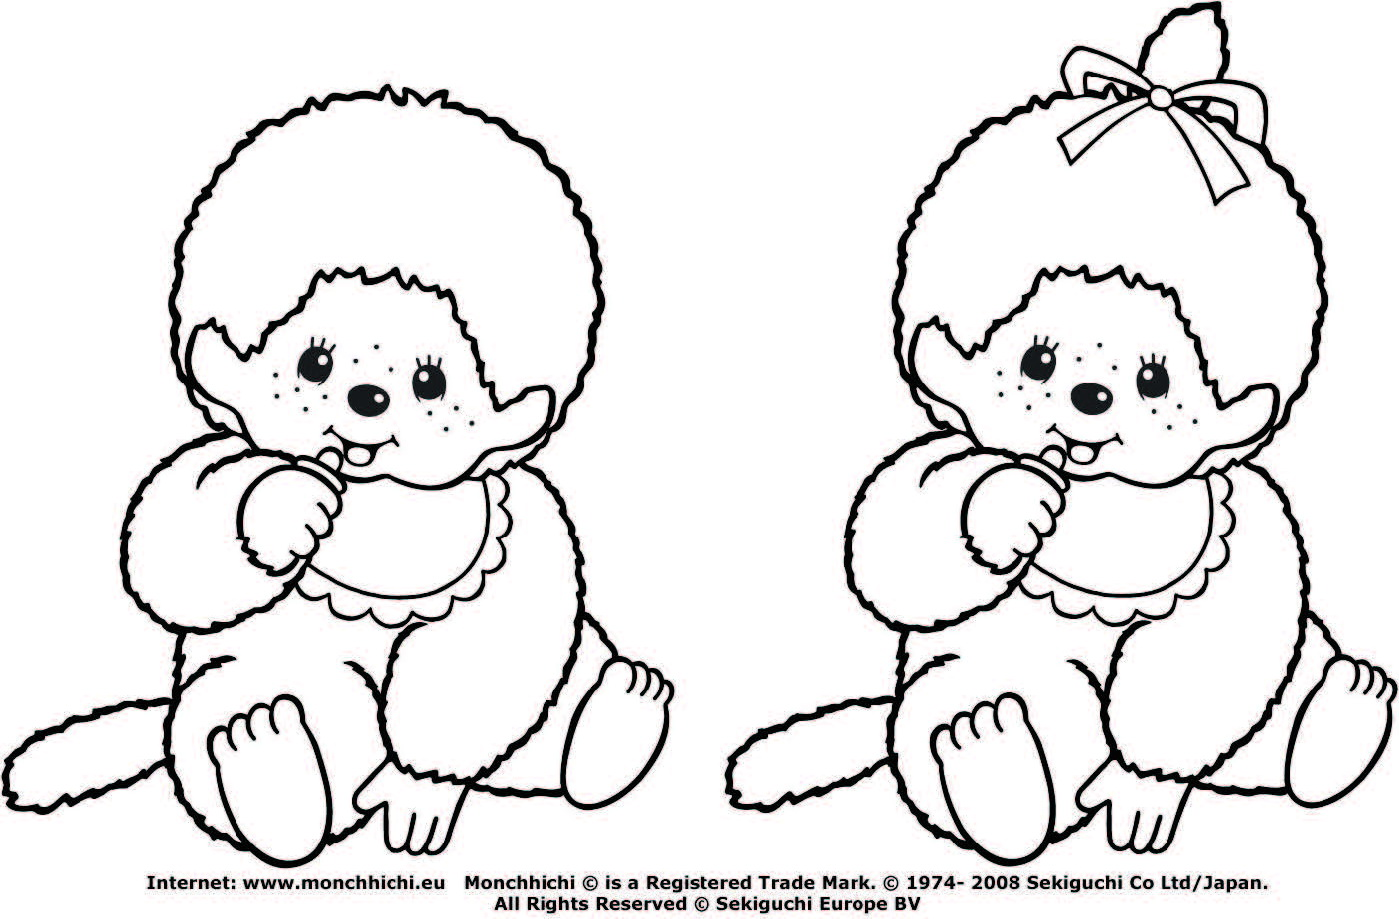 monchichi coloring pages - photo#22